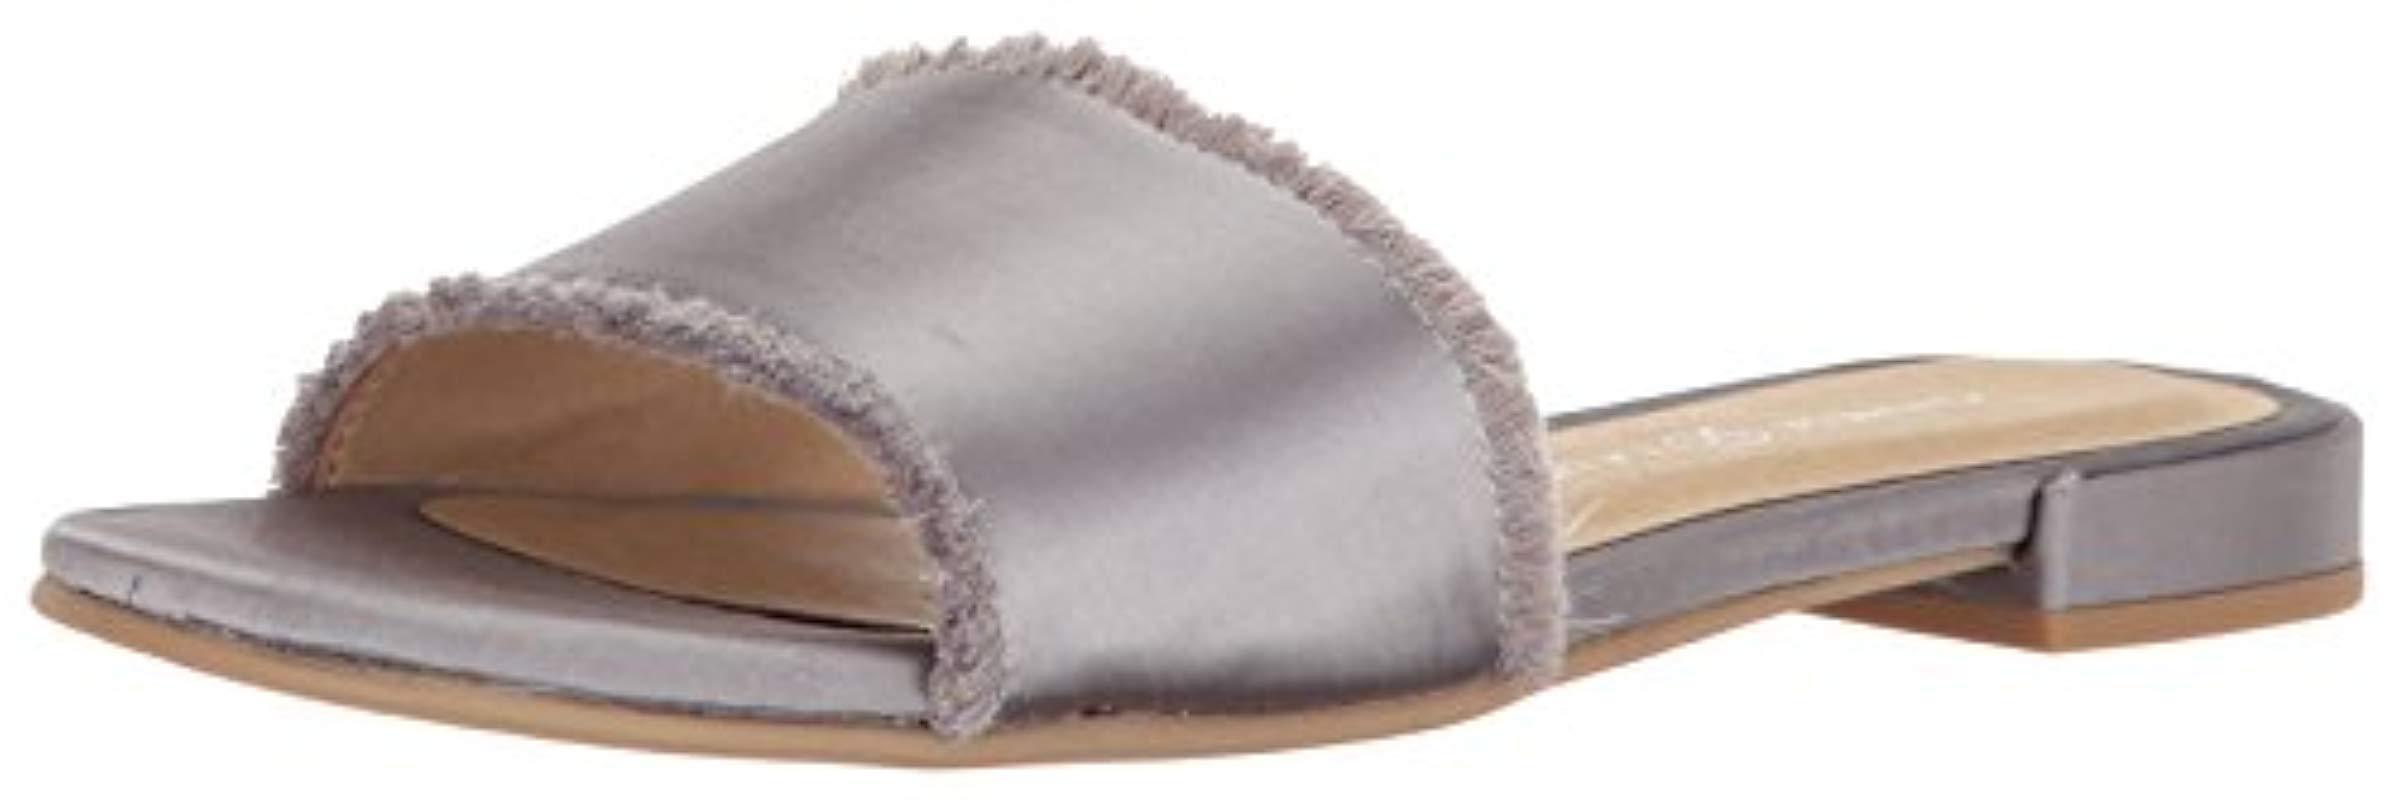 817d92b140eb Lyst - Chinese Laundry Pattie Slide Sandal in Metallic - Save ...